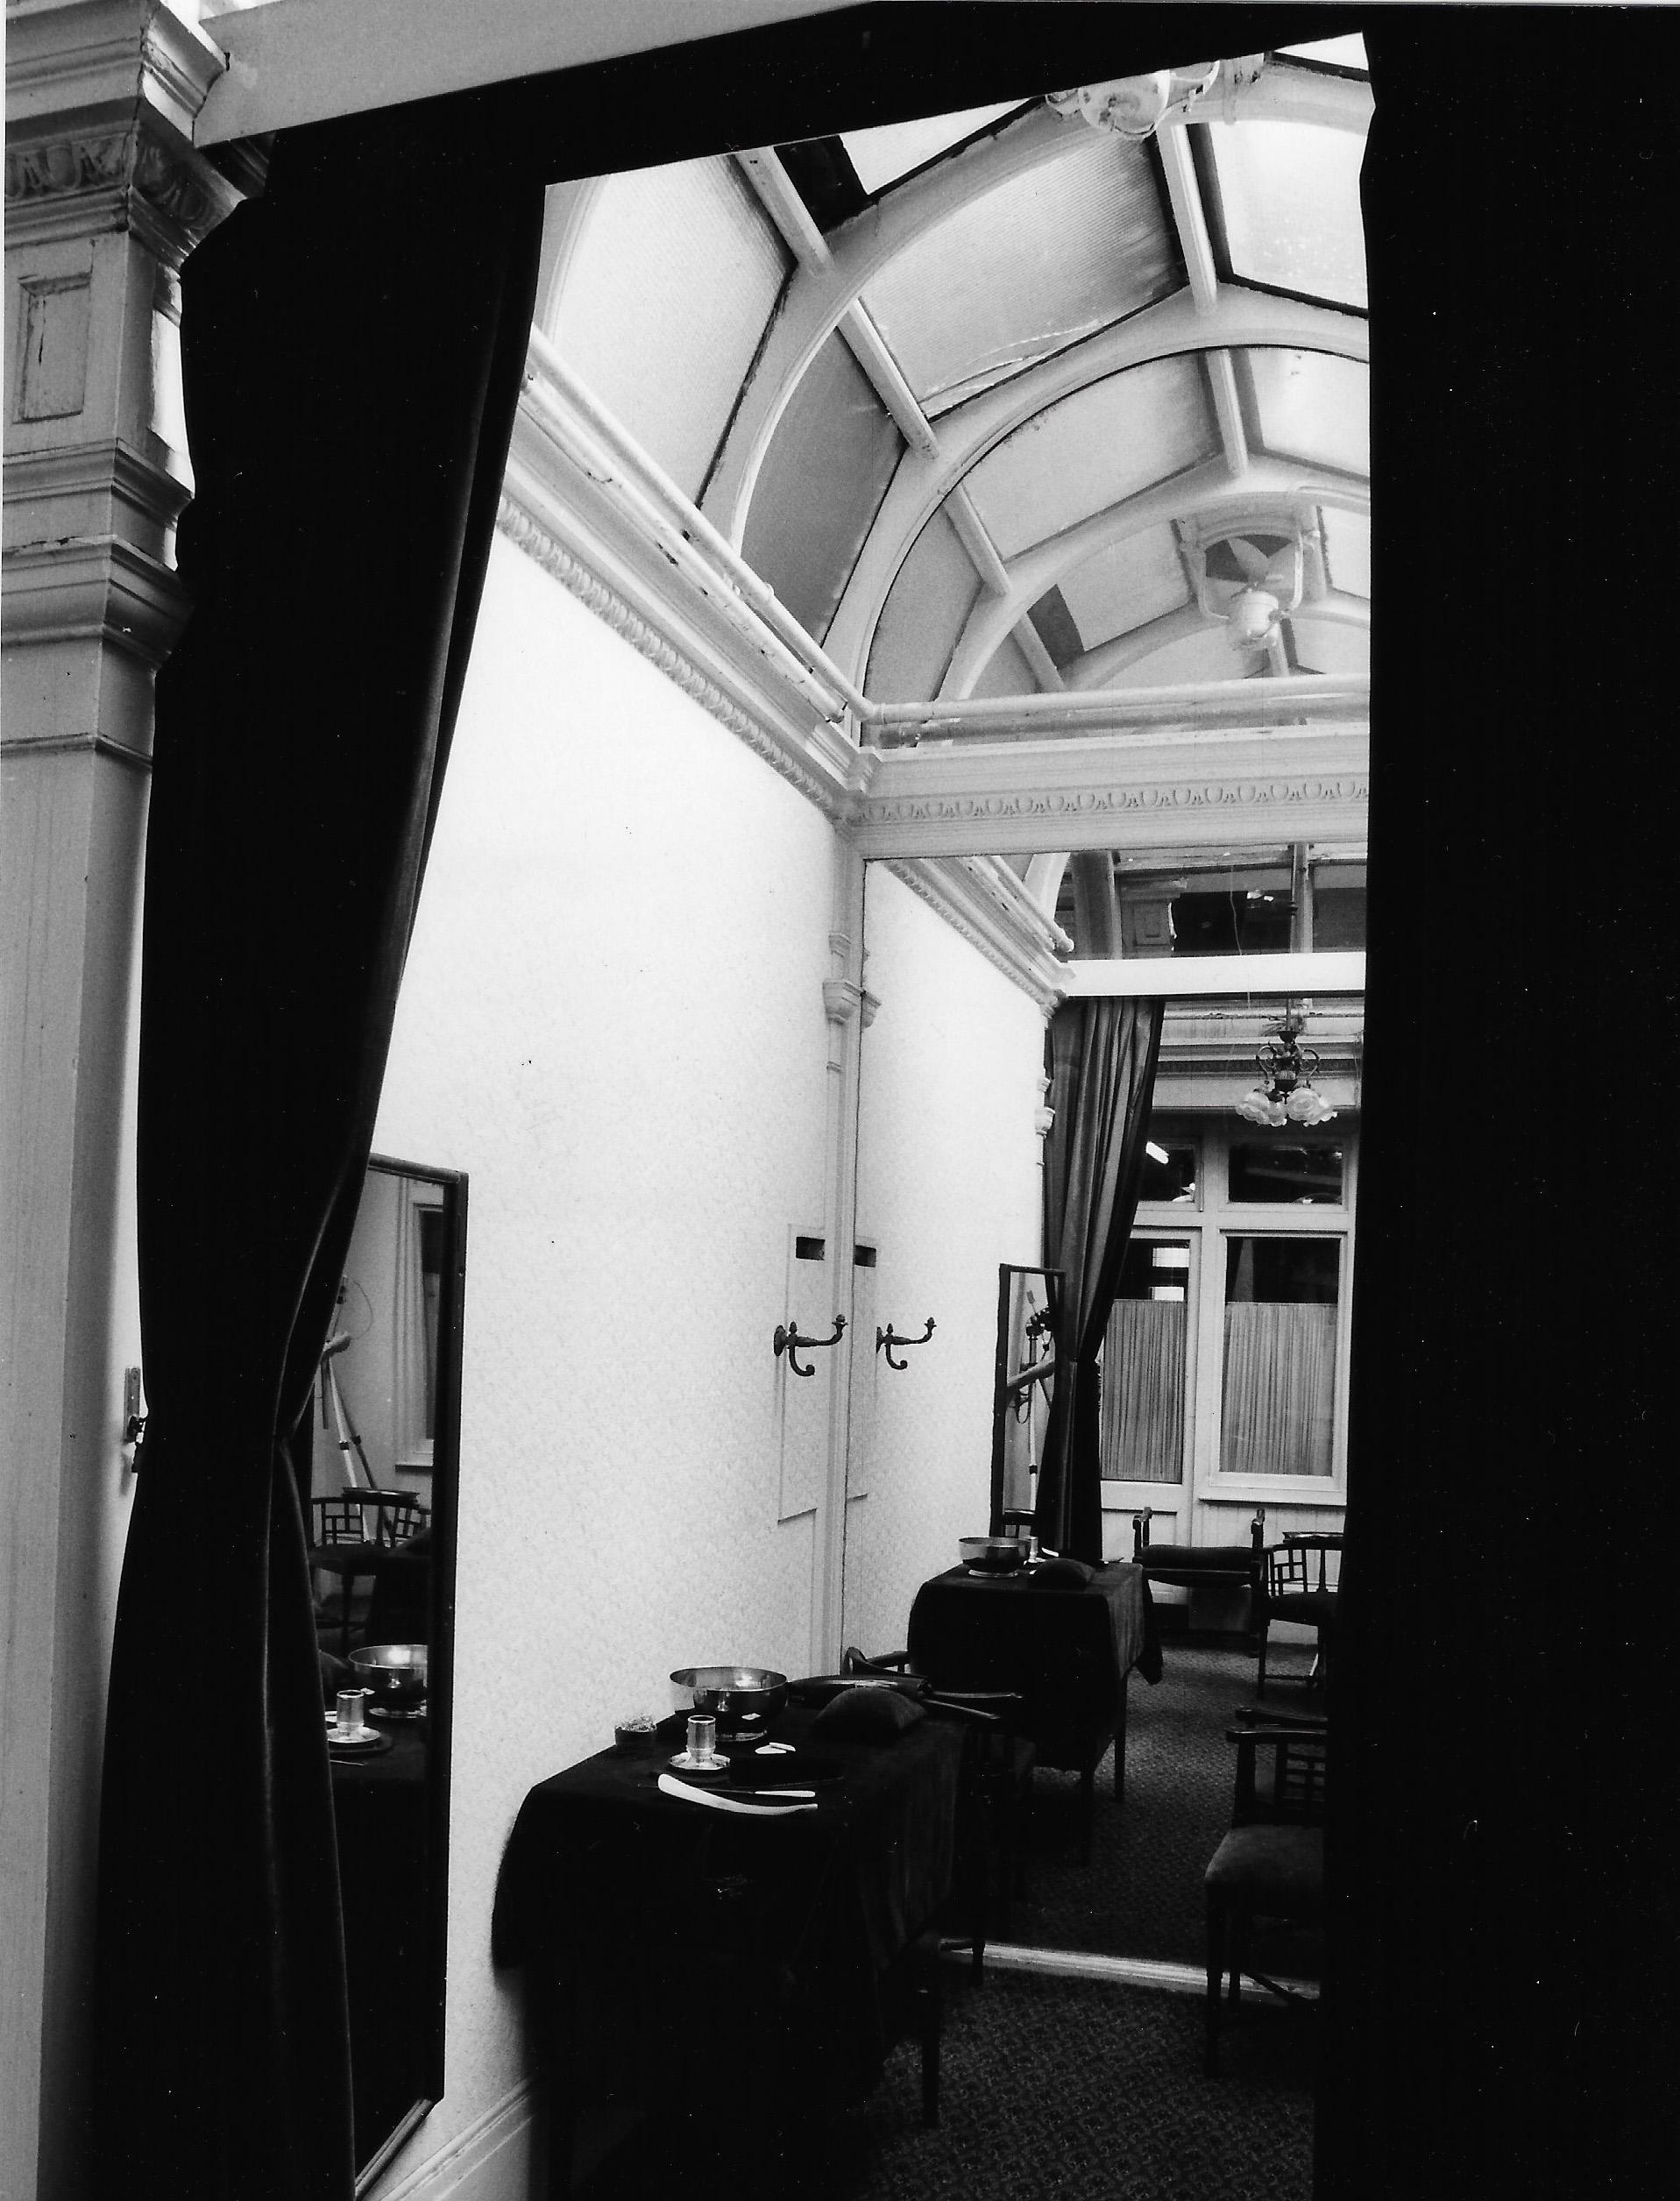 Bespoke Tailoring Fitting Room